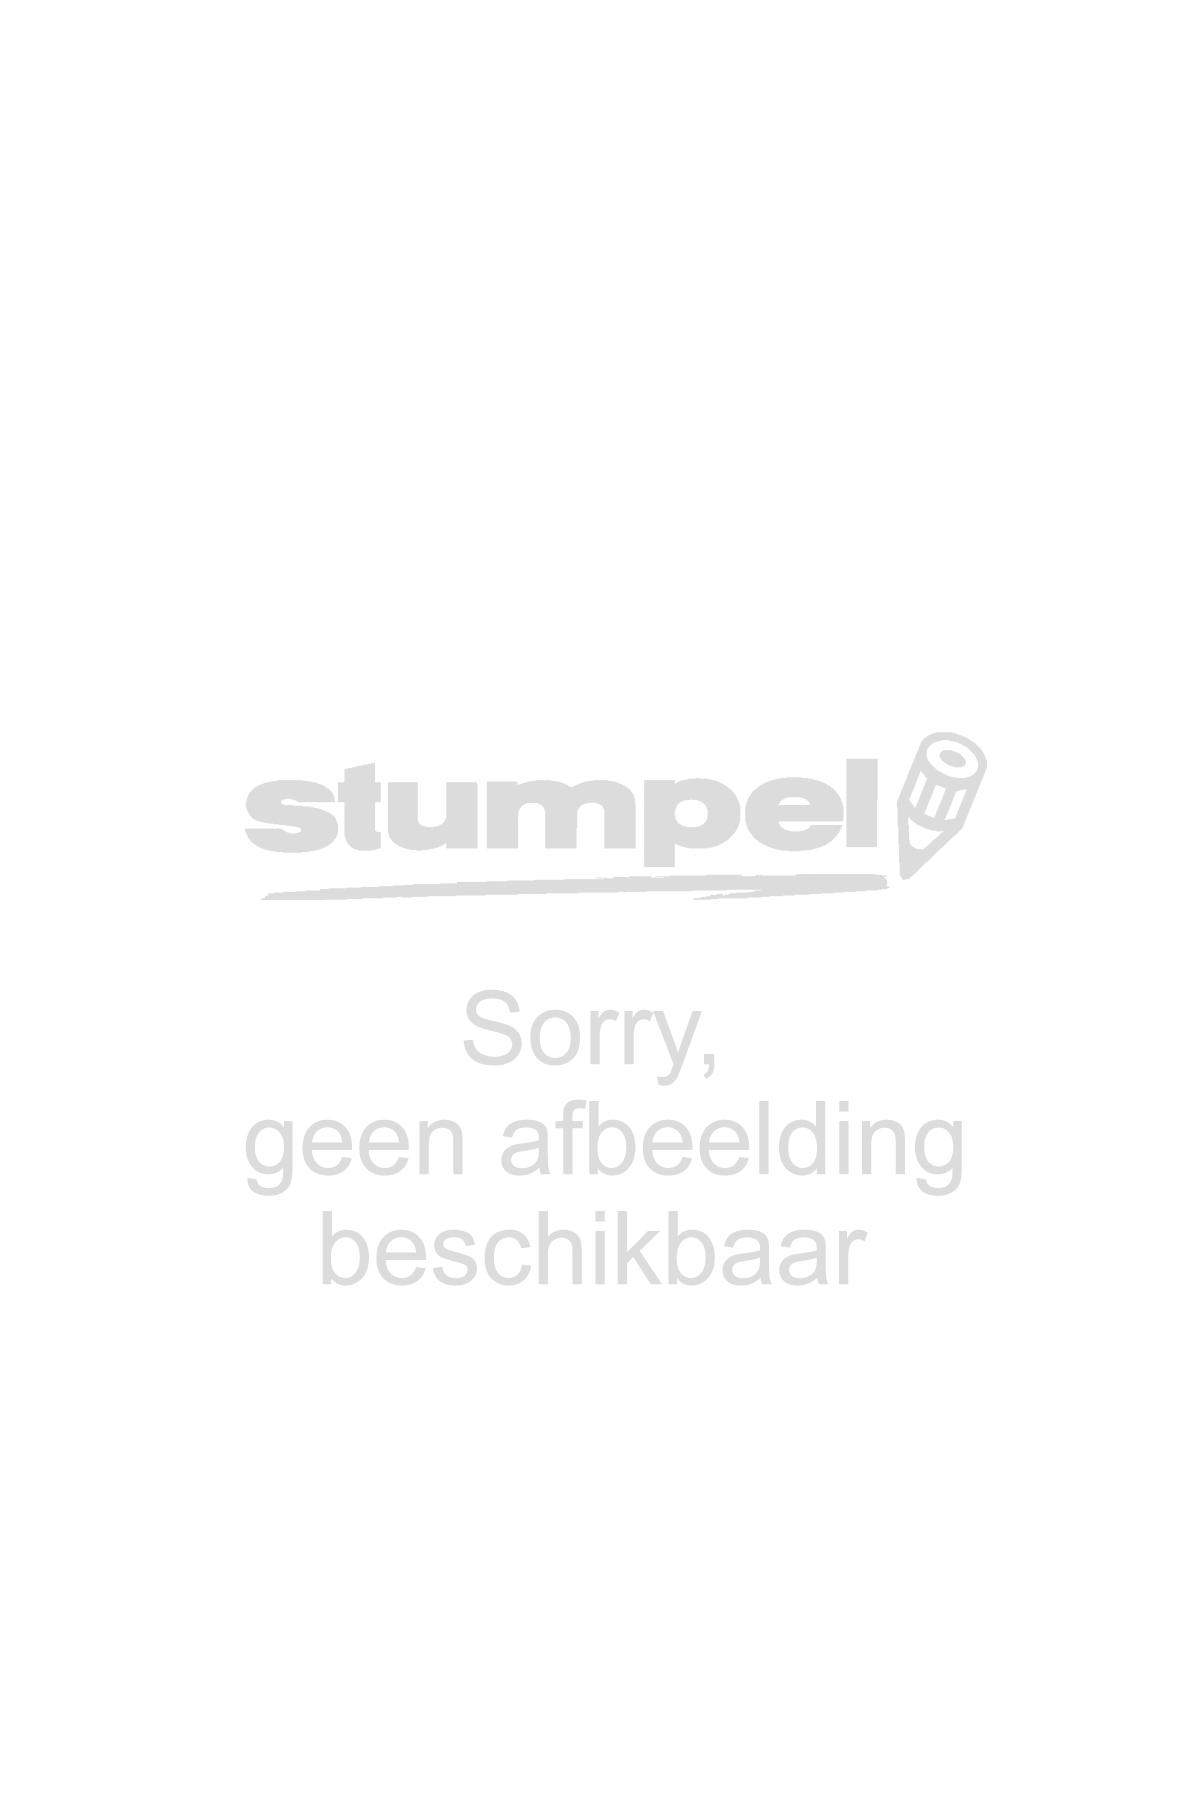 magneetkaart-holland-molens-10693916